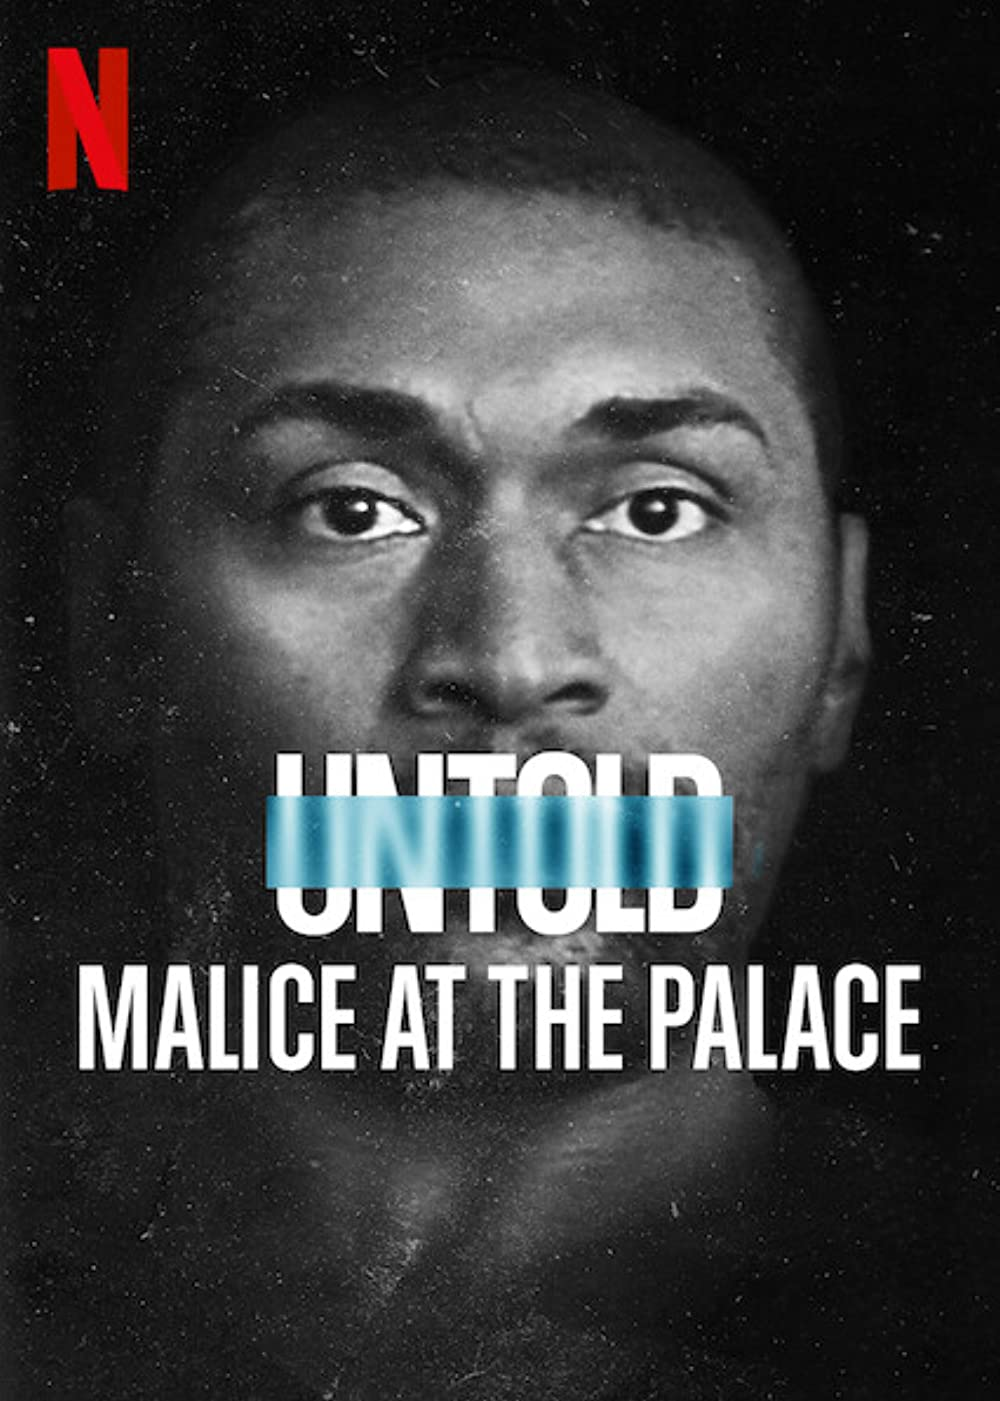 Untold: Malice at the Palace (2021) - IMDb